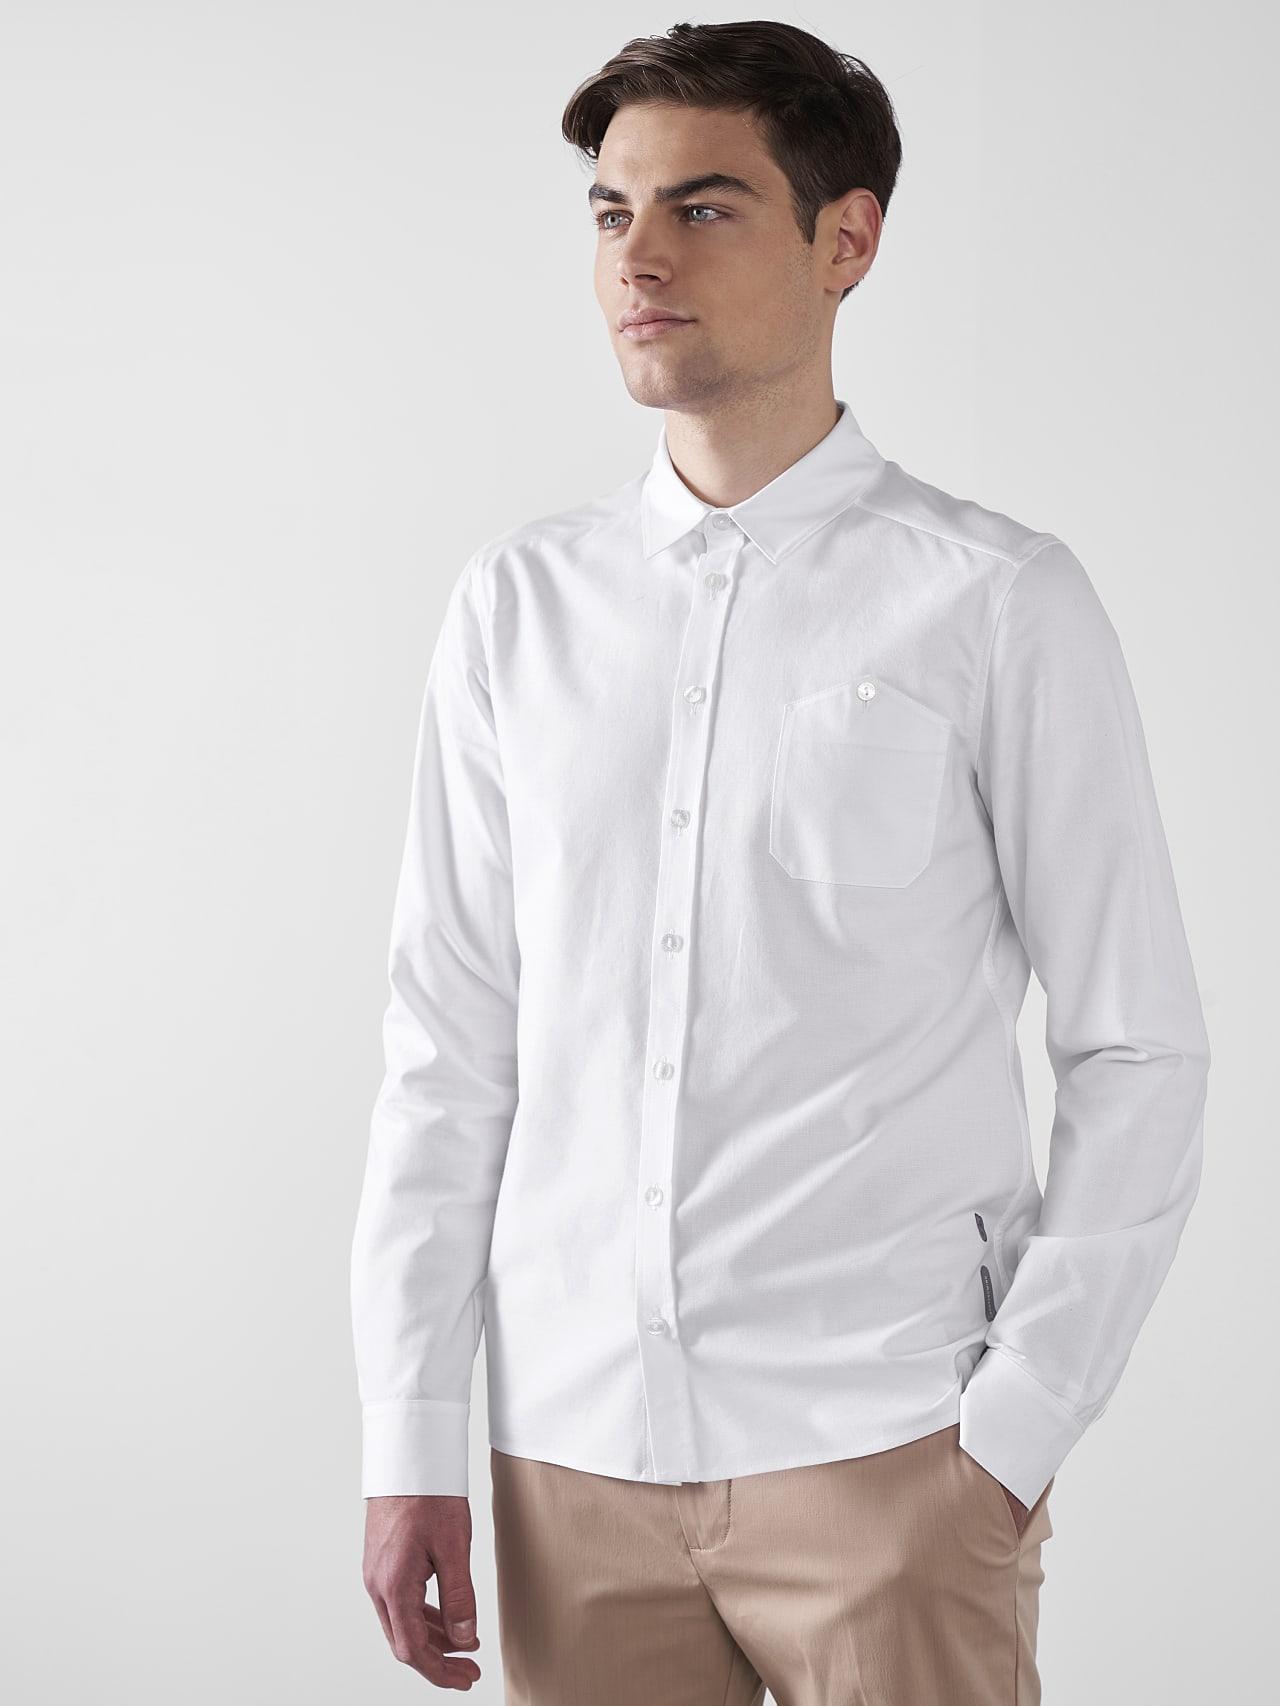 WOSKA V2.Y5.01 Kent Collar Oxford Shirt white Front Alpha Tauri